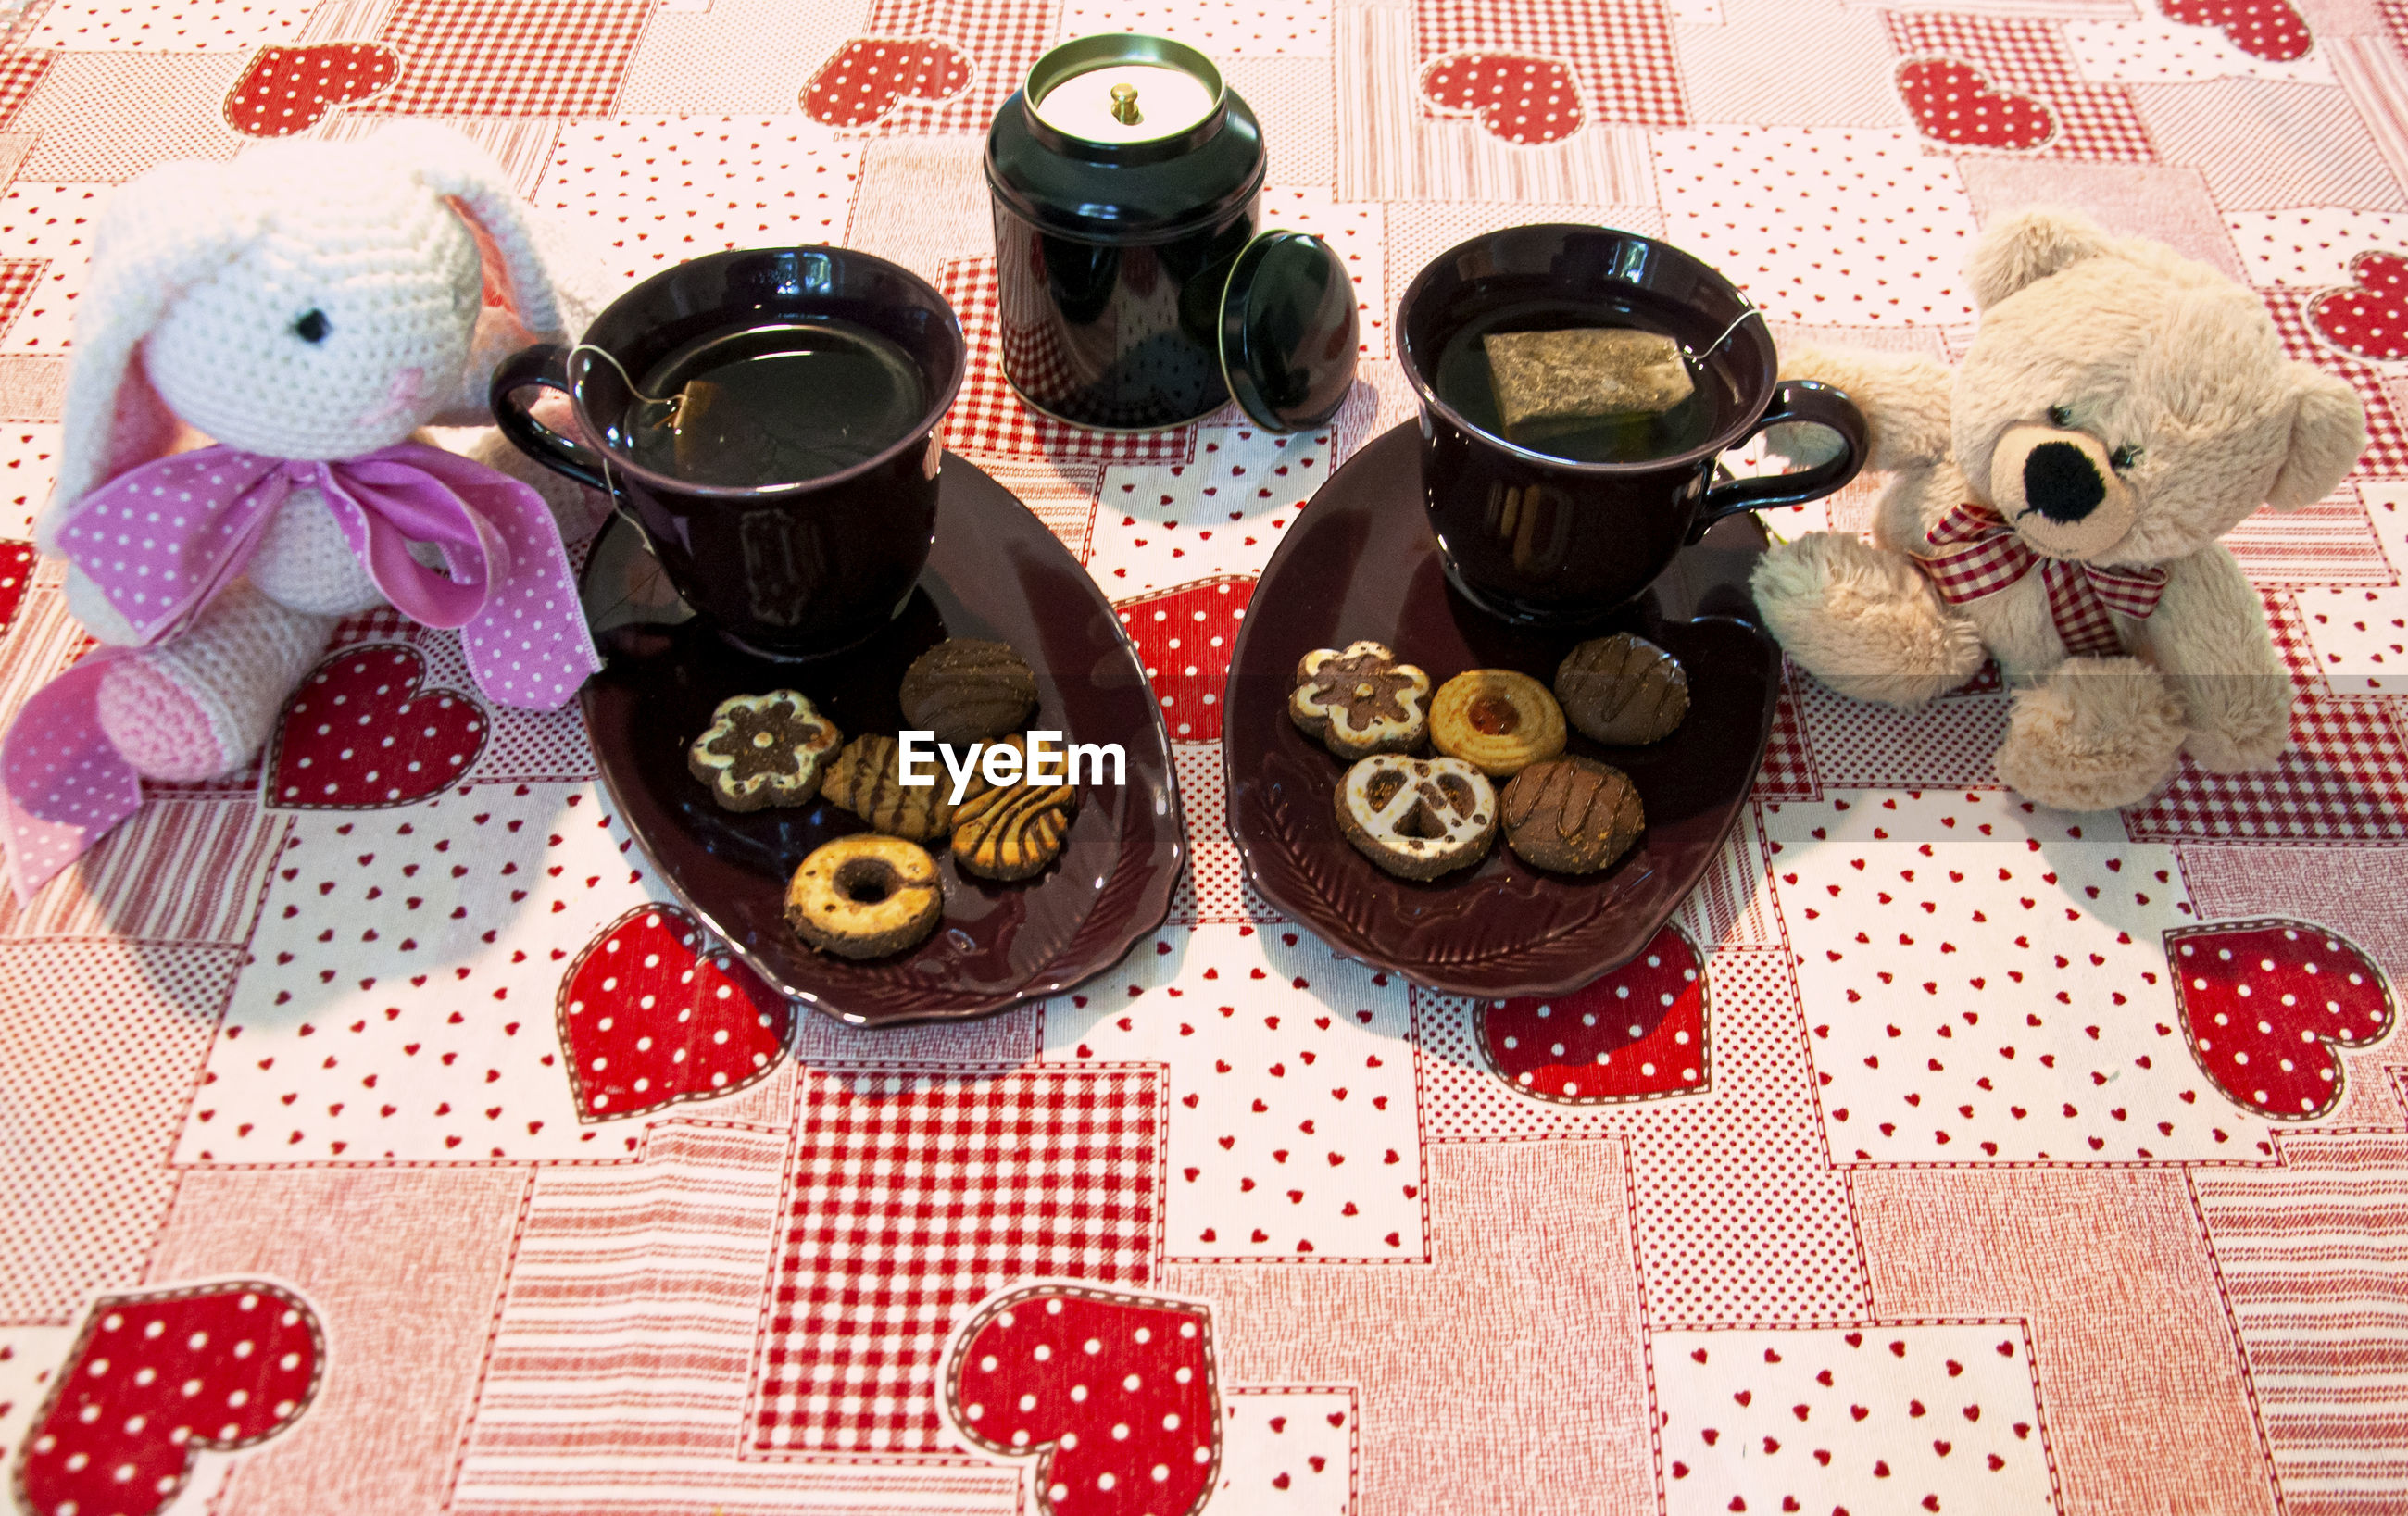 HIGH ANGLE VIEW OF COFFEE CUPS